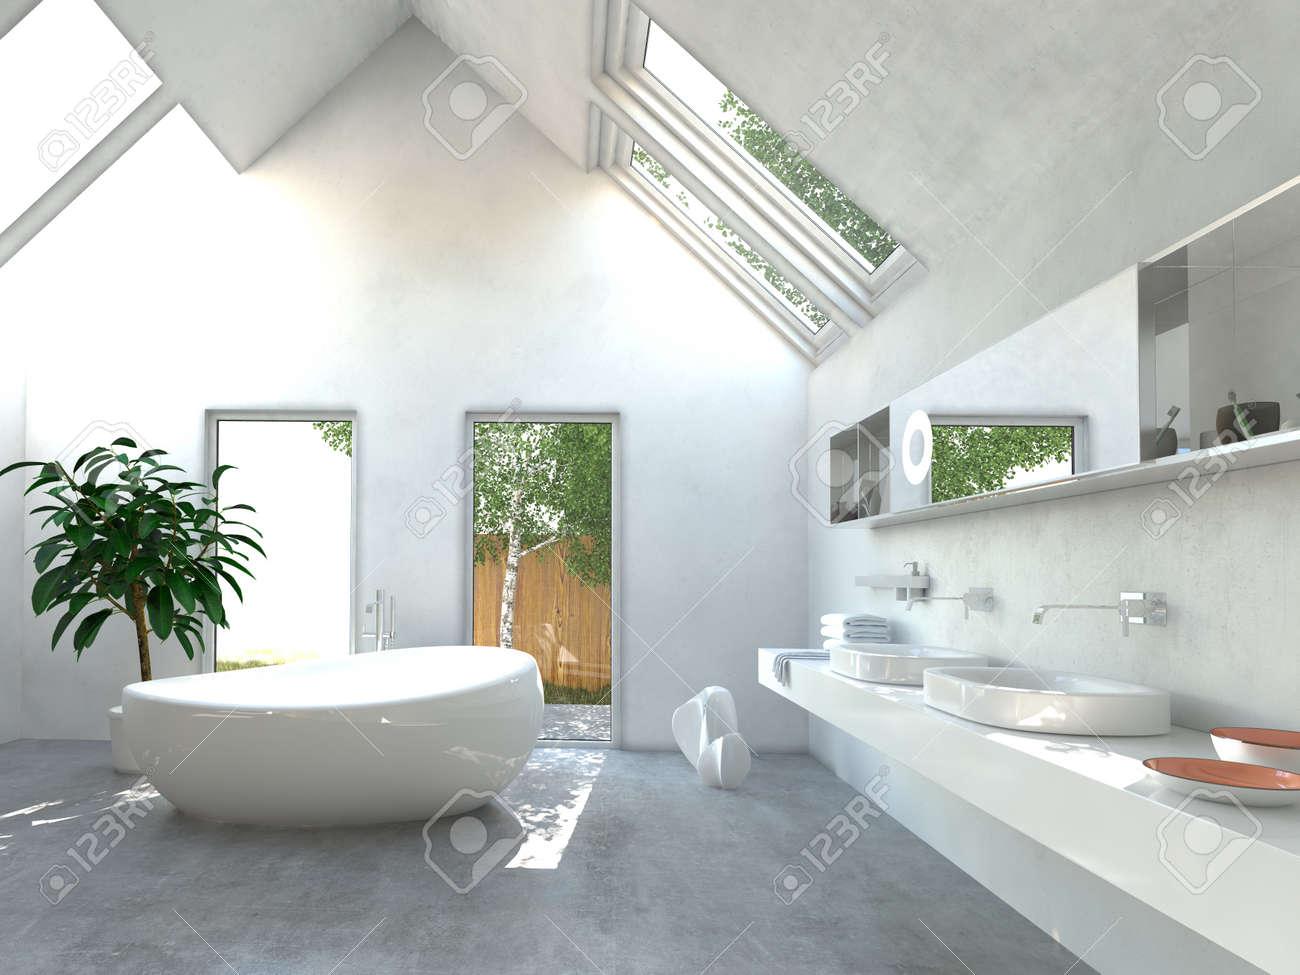 Modern light bright bathroom interior with a